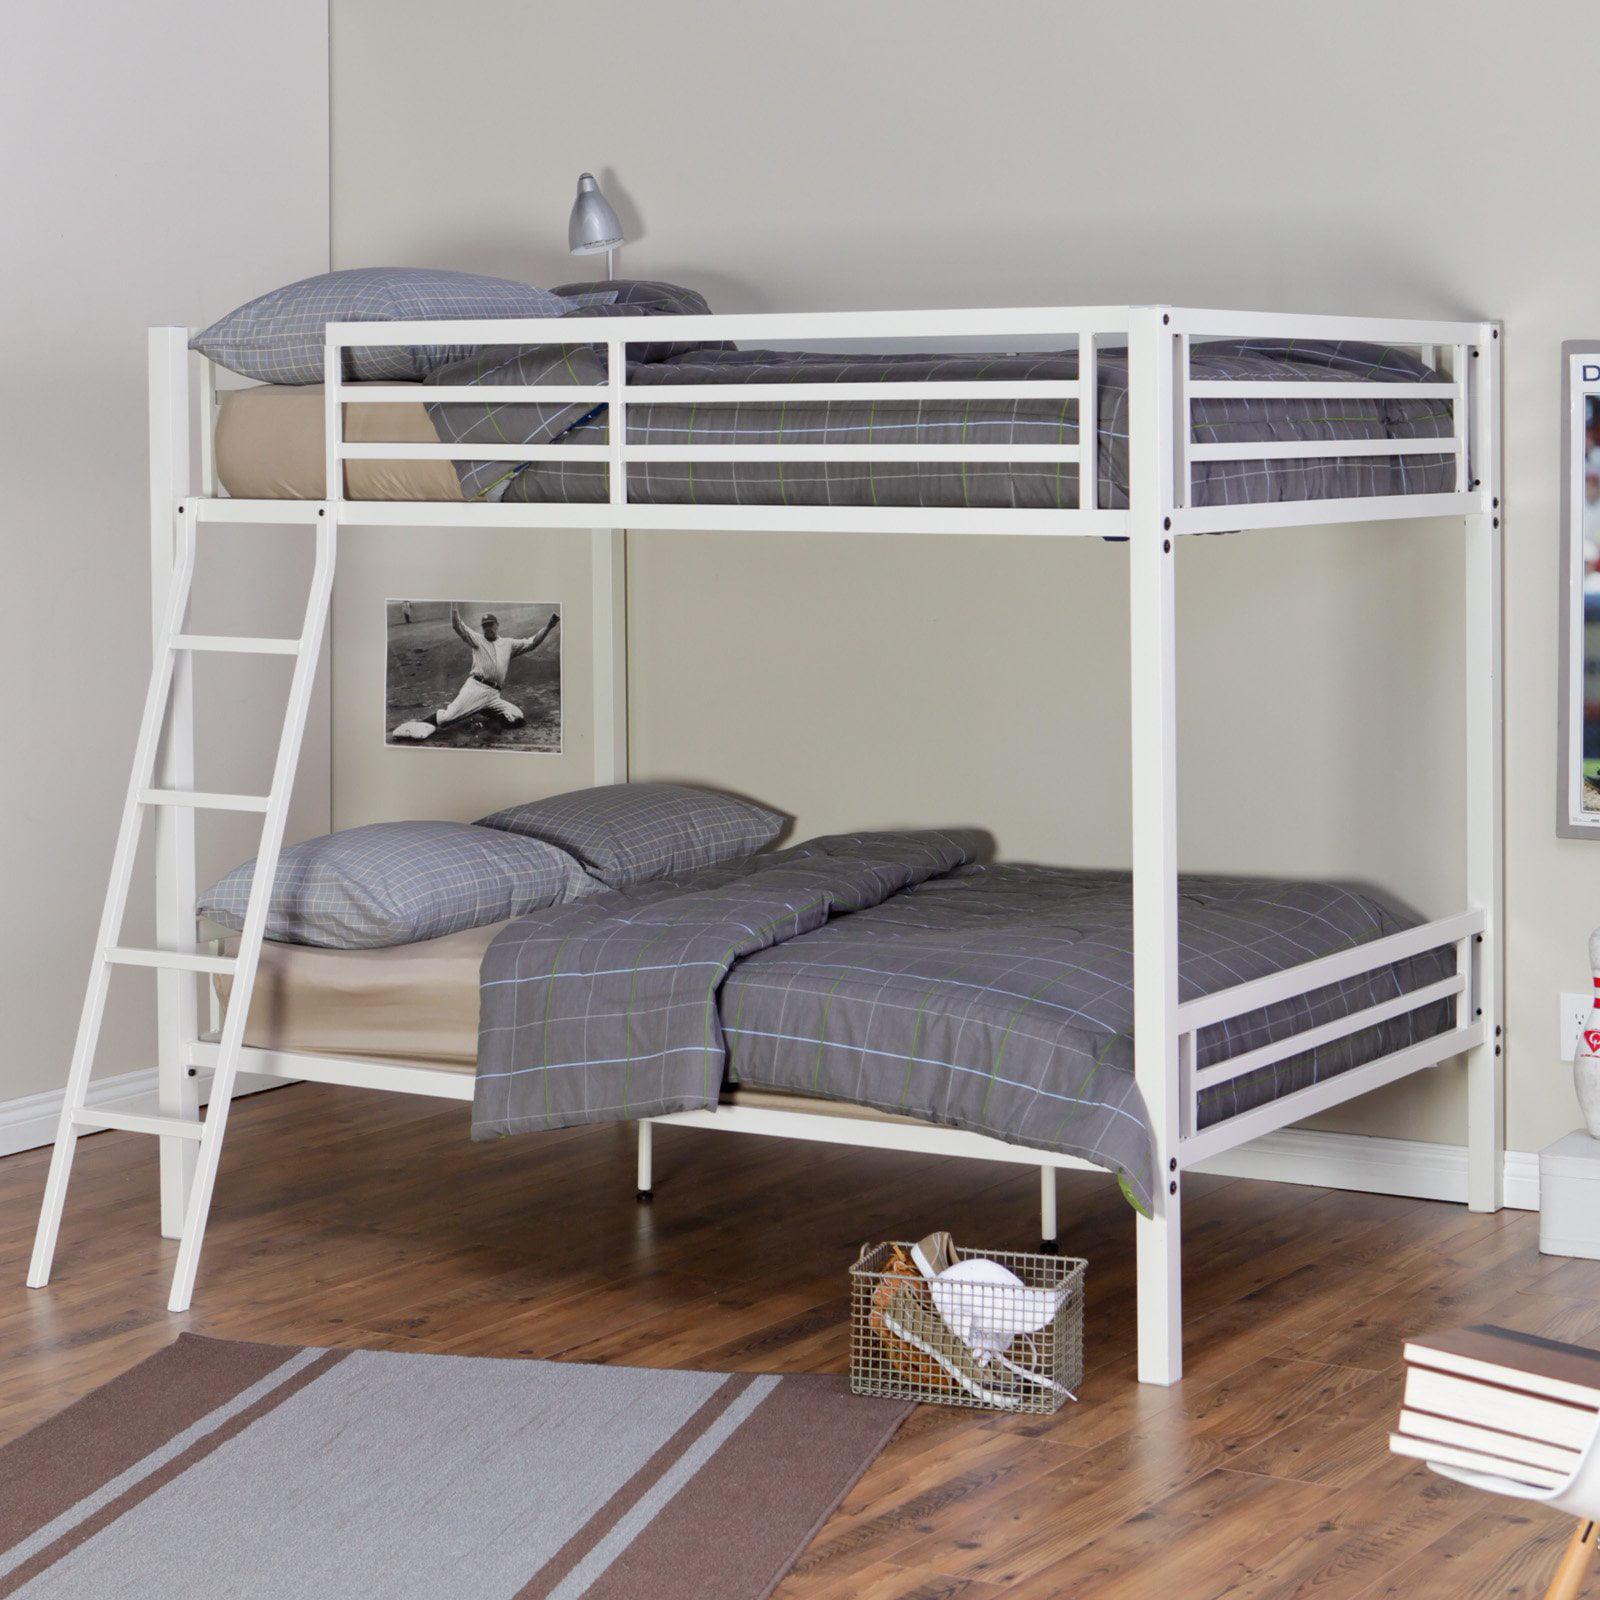 Duro Hanley Full over Full Bunk Bed White by